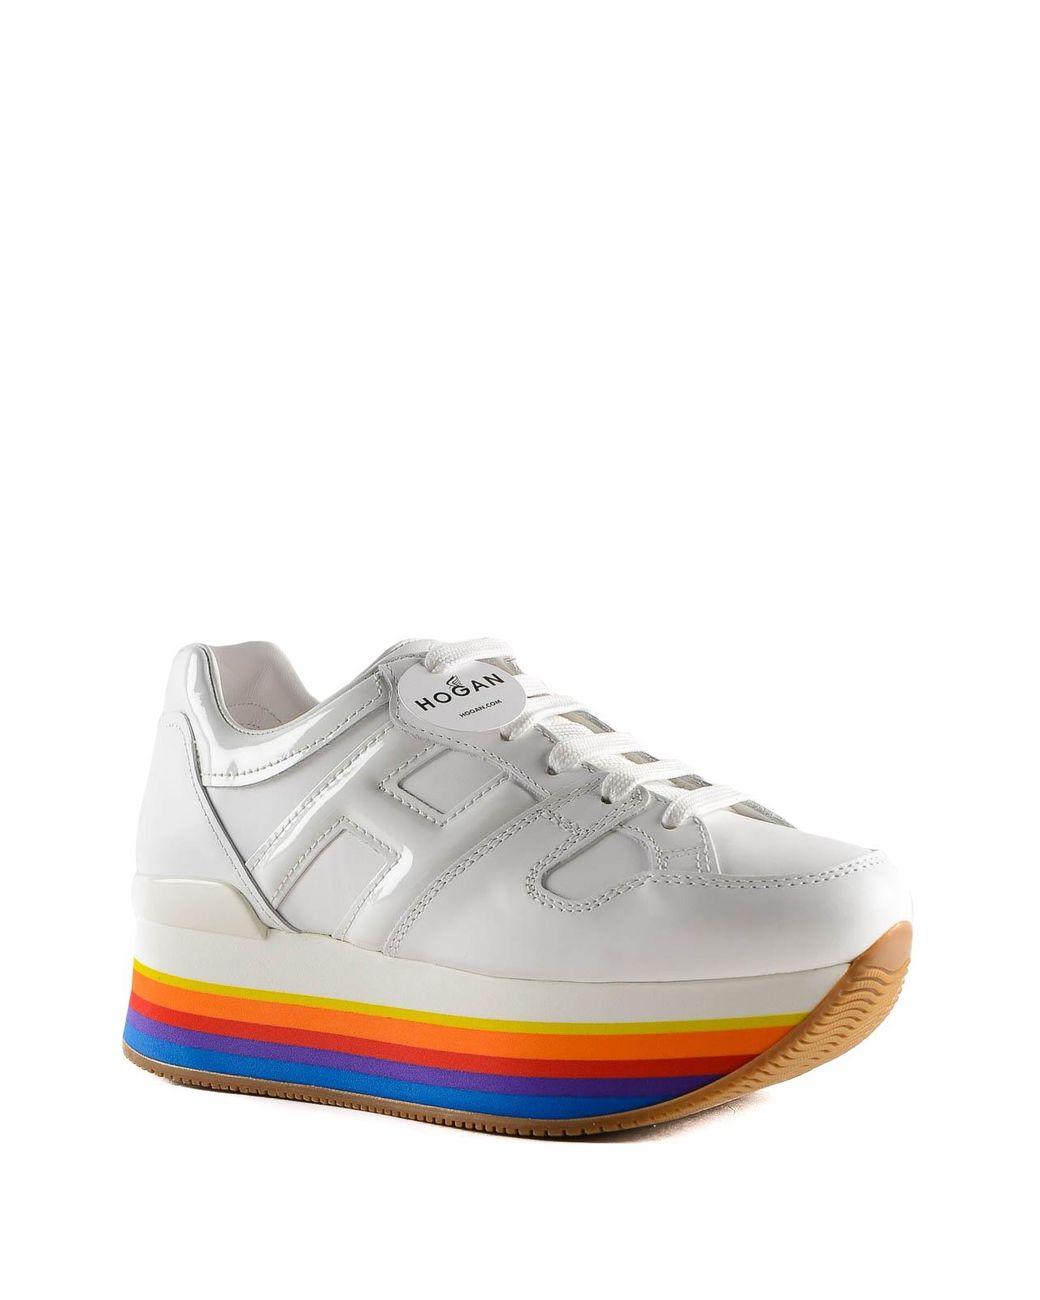 Maxi H222 Rainbow Platform Sneakers